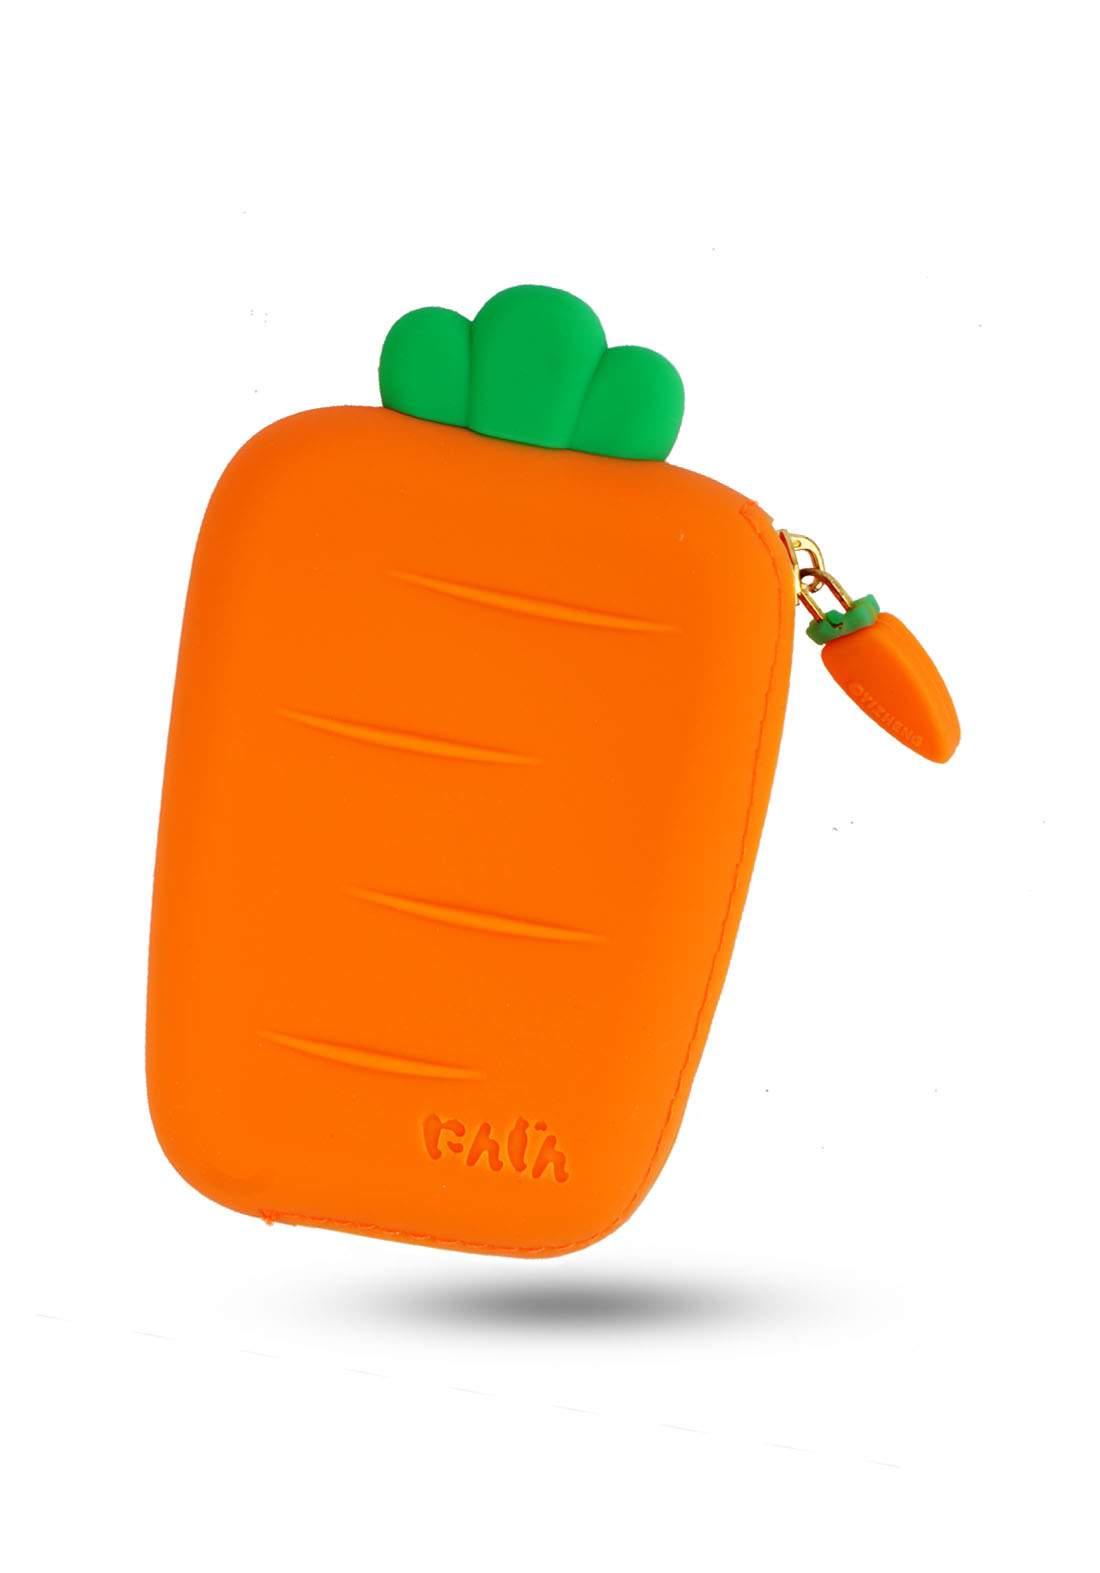 small wallet YZ-0033 -Orange  محفظة صغيرة